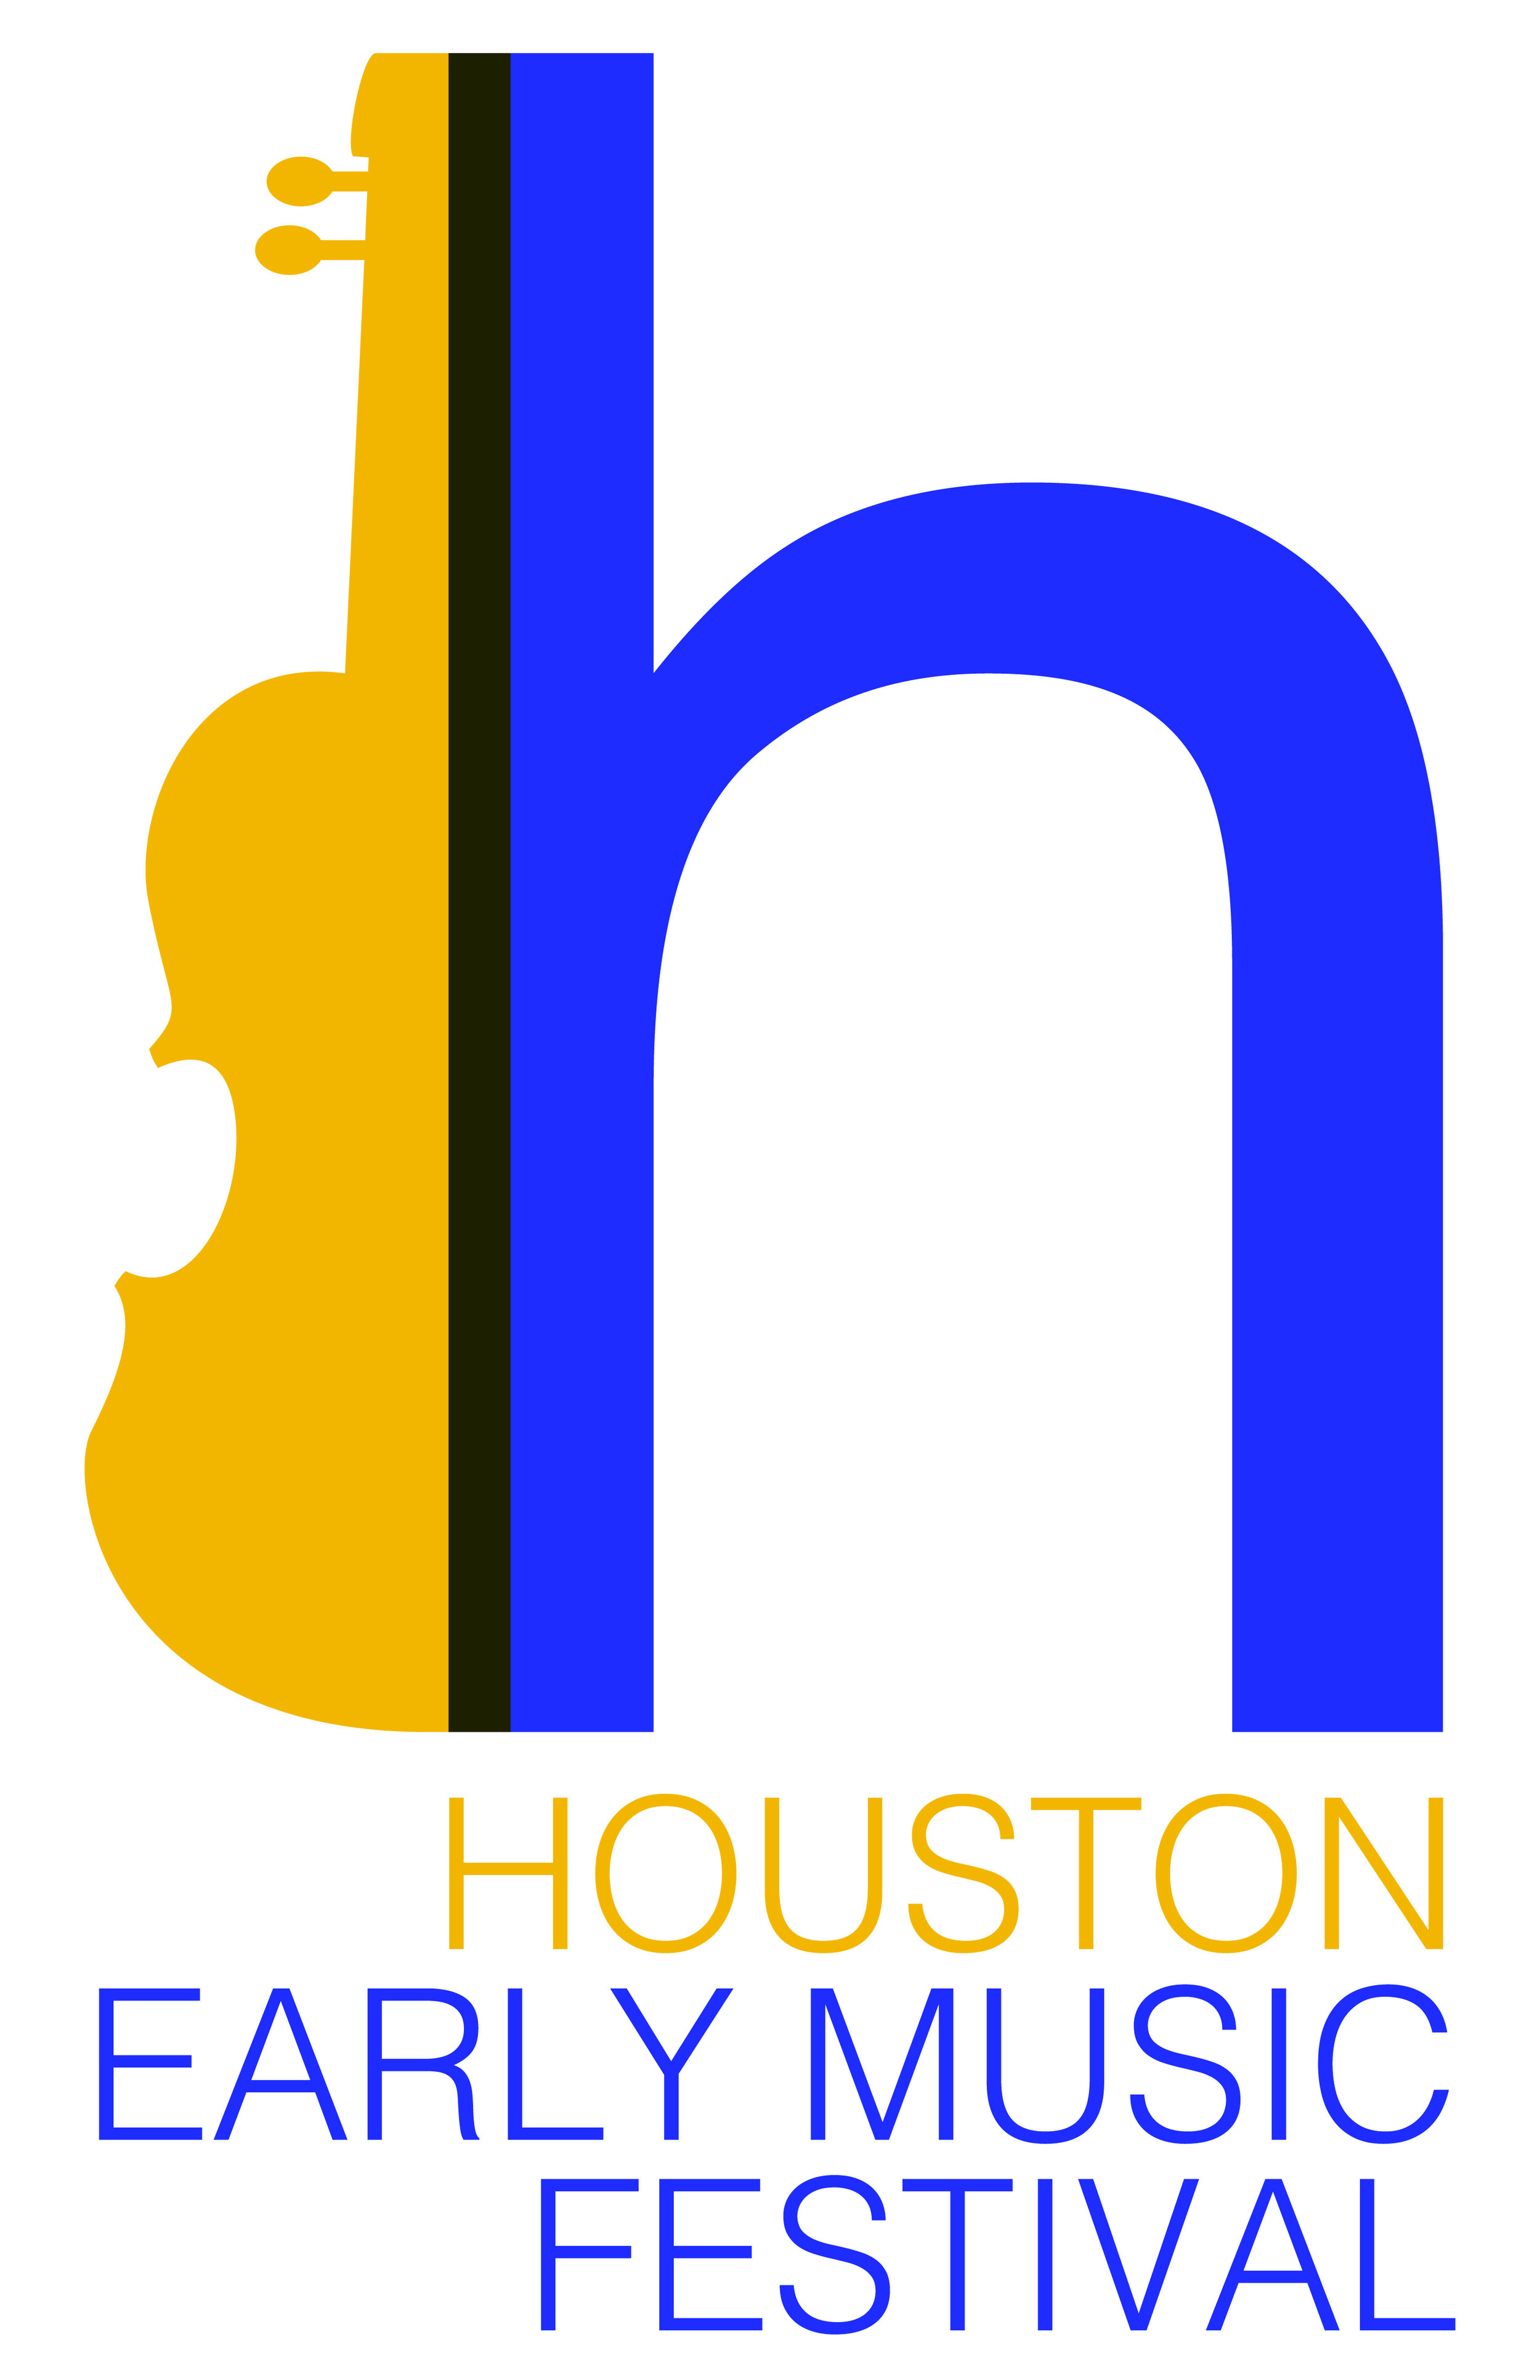 Houston Early Music Festival    February 11-19, 2017